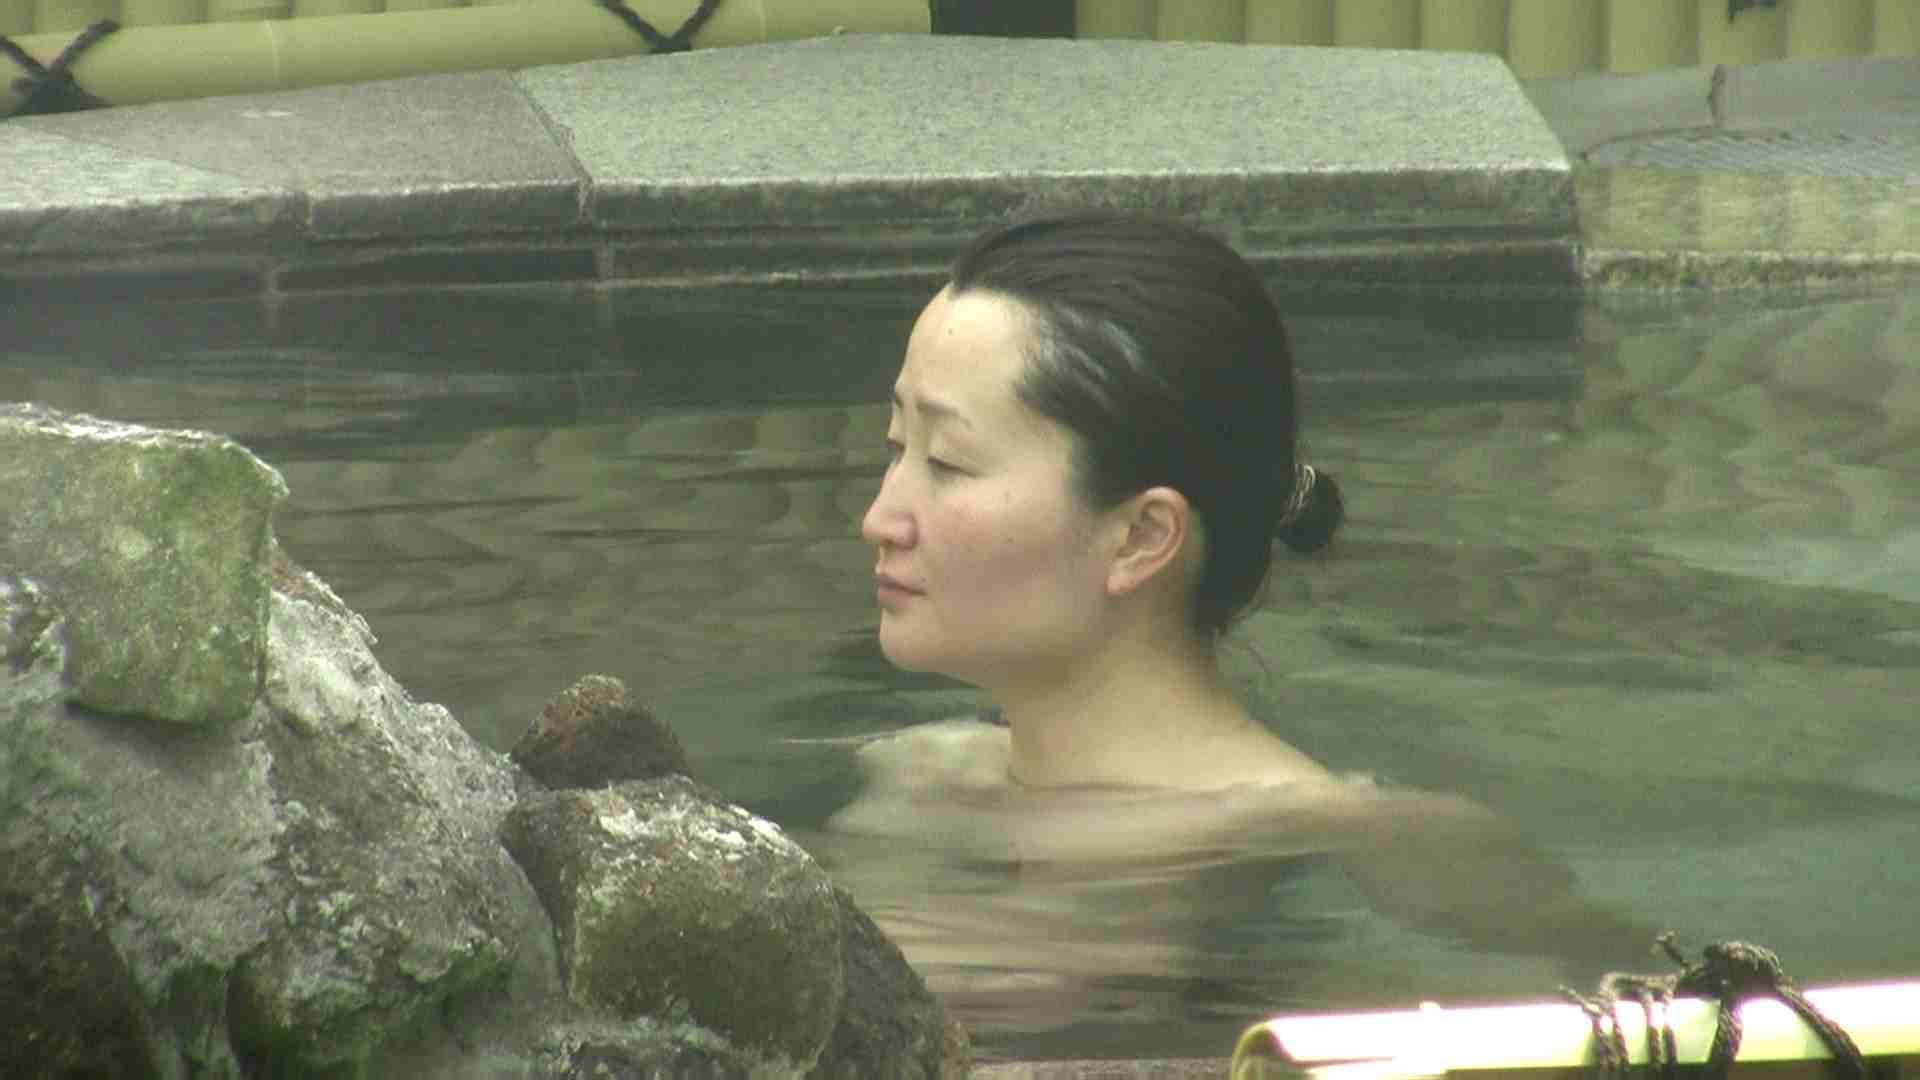 Aquaな露天風呂Vol.632 盗撮 | OLセックス  70画像 31